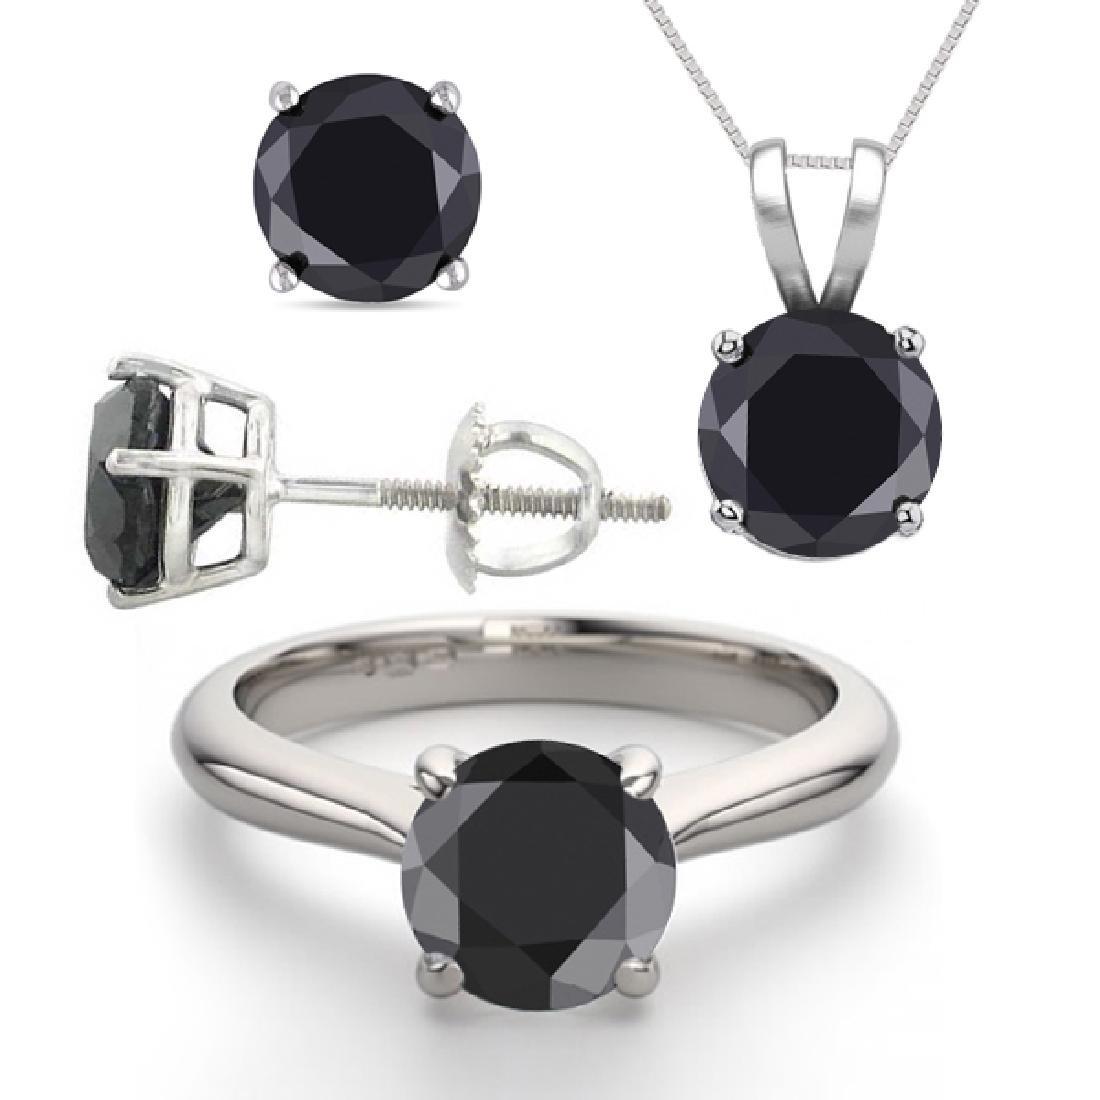 14K White Gold Jewelry SET 6.0CTW Black Diamond Ring,